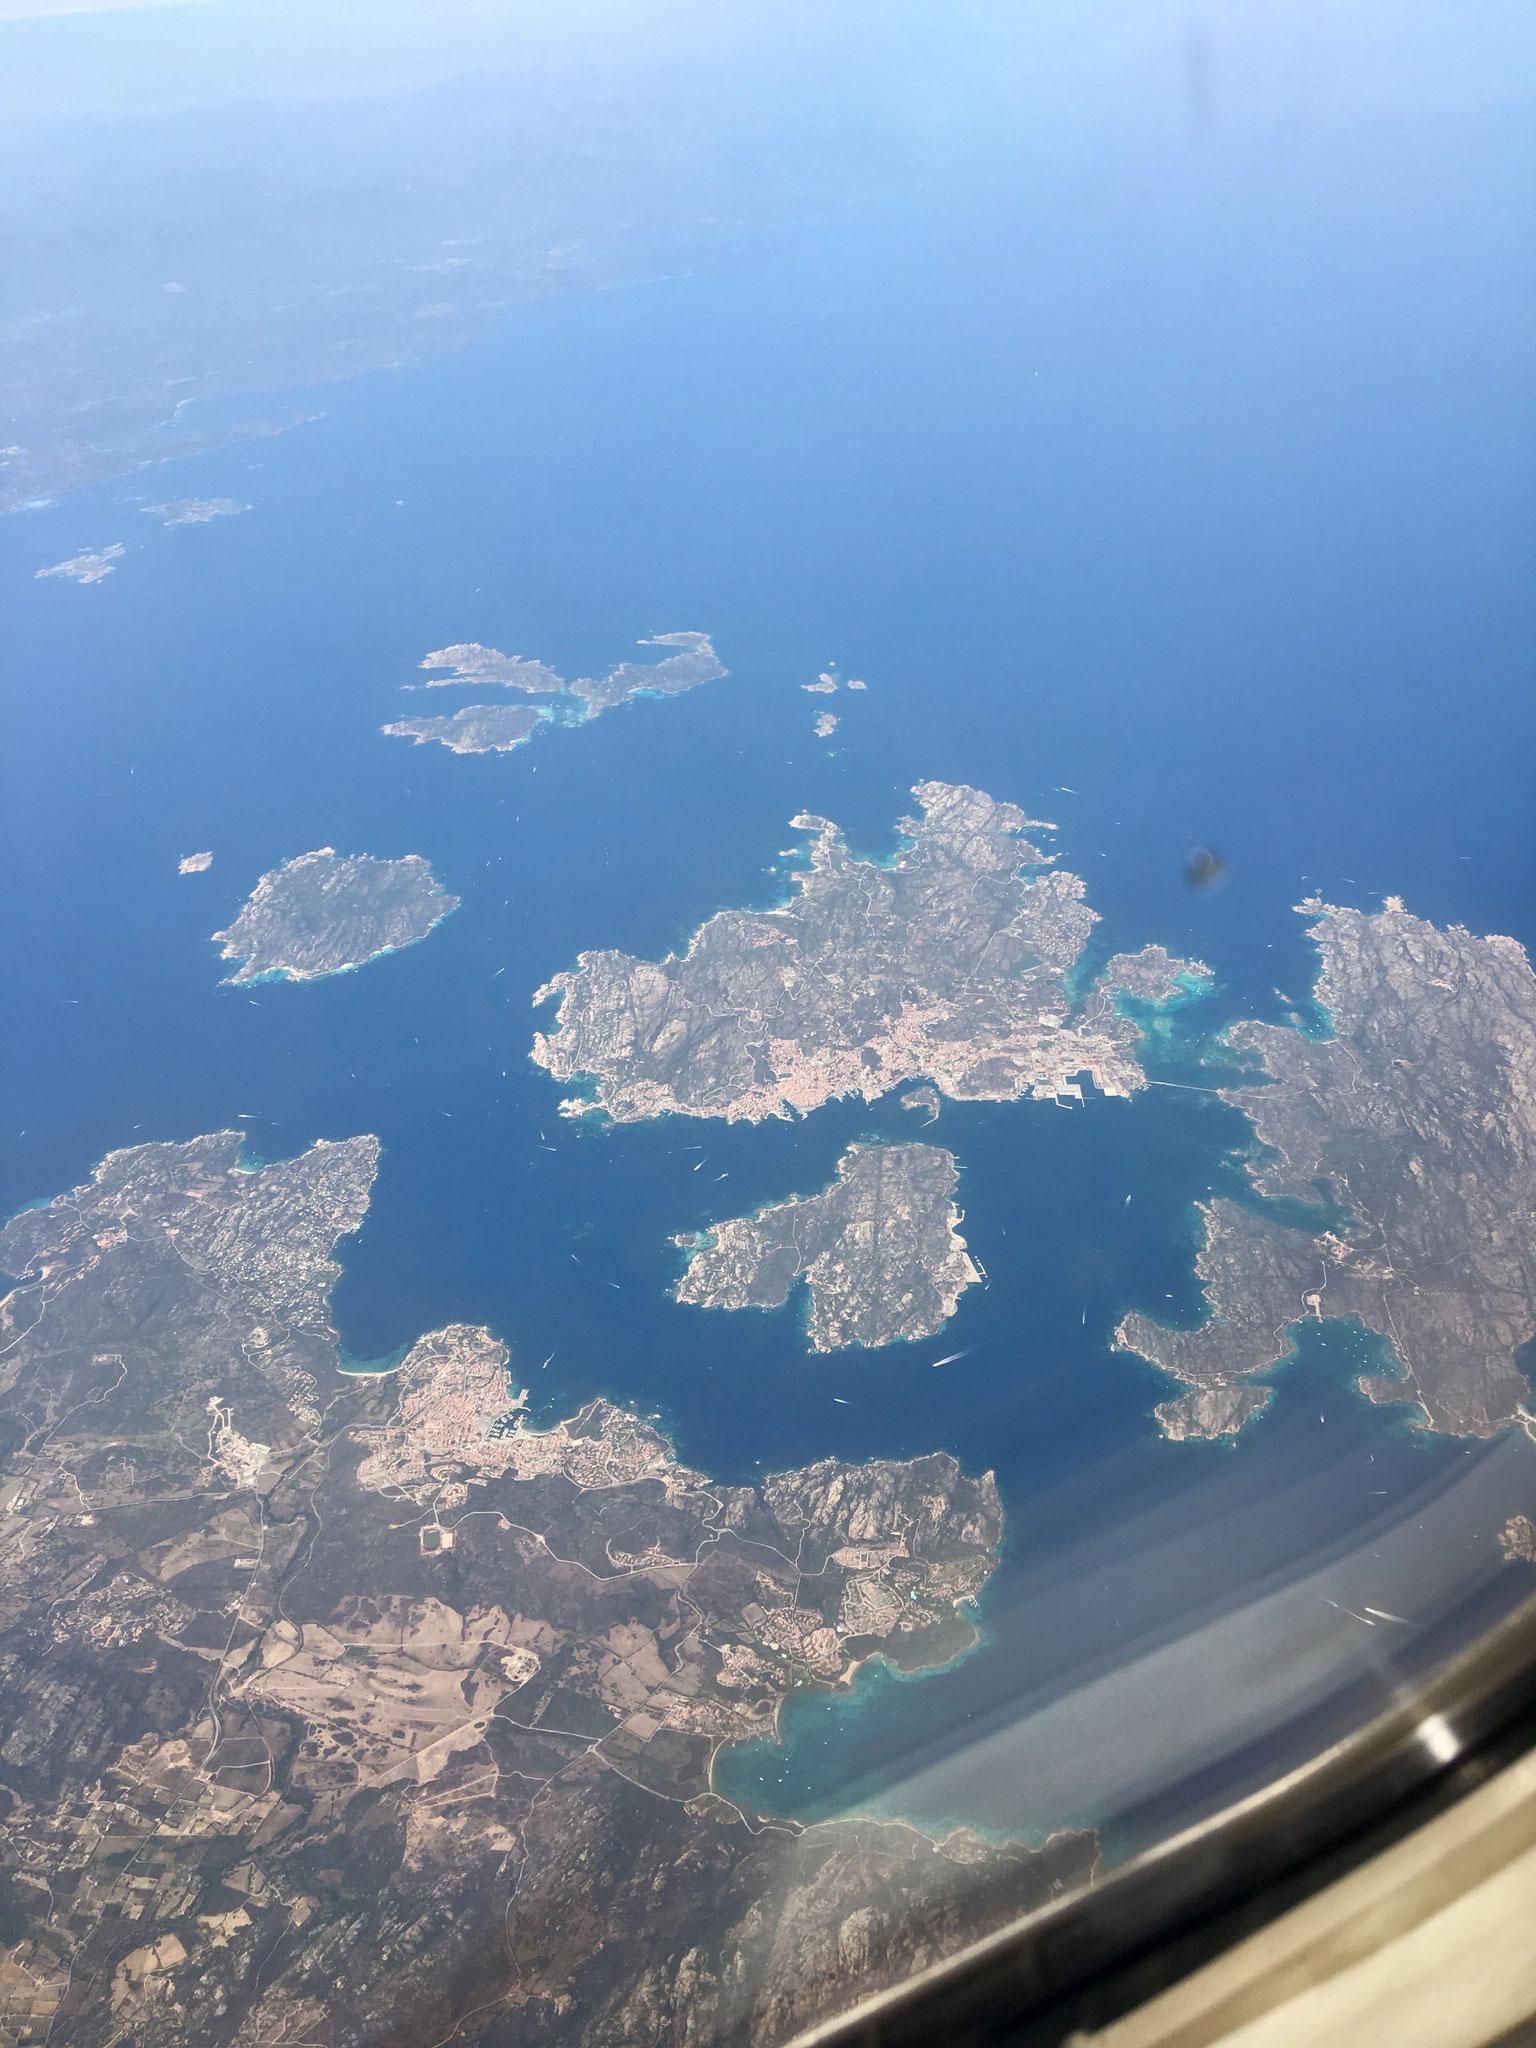 LA Maddalena islands from the air